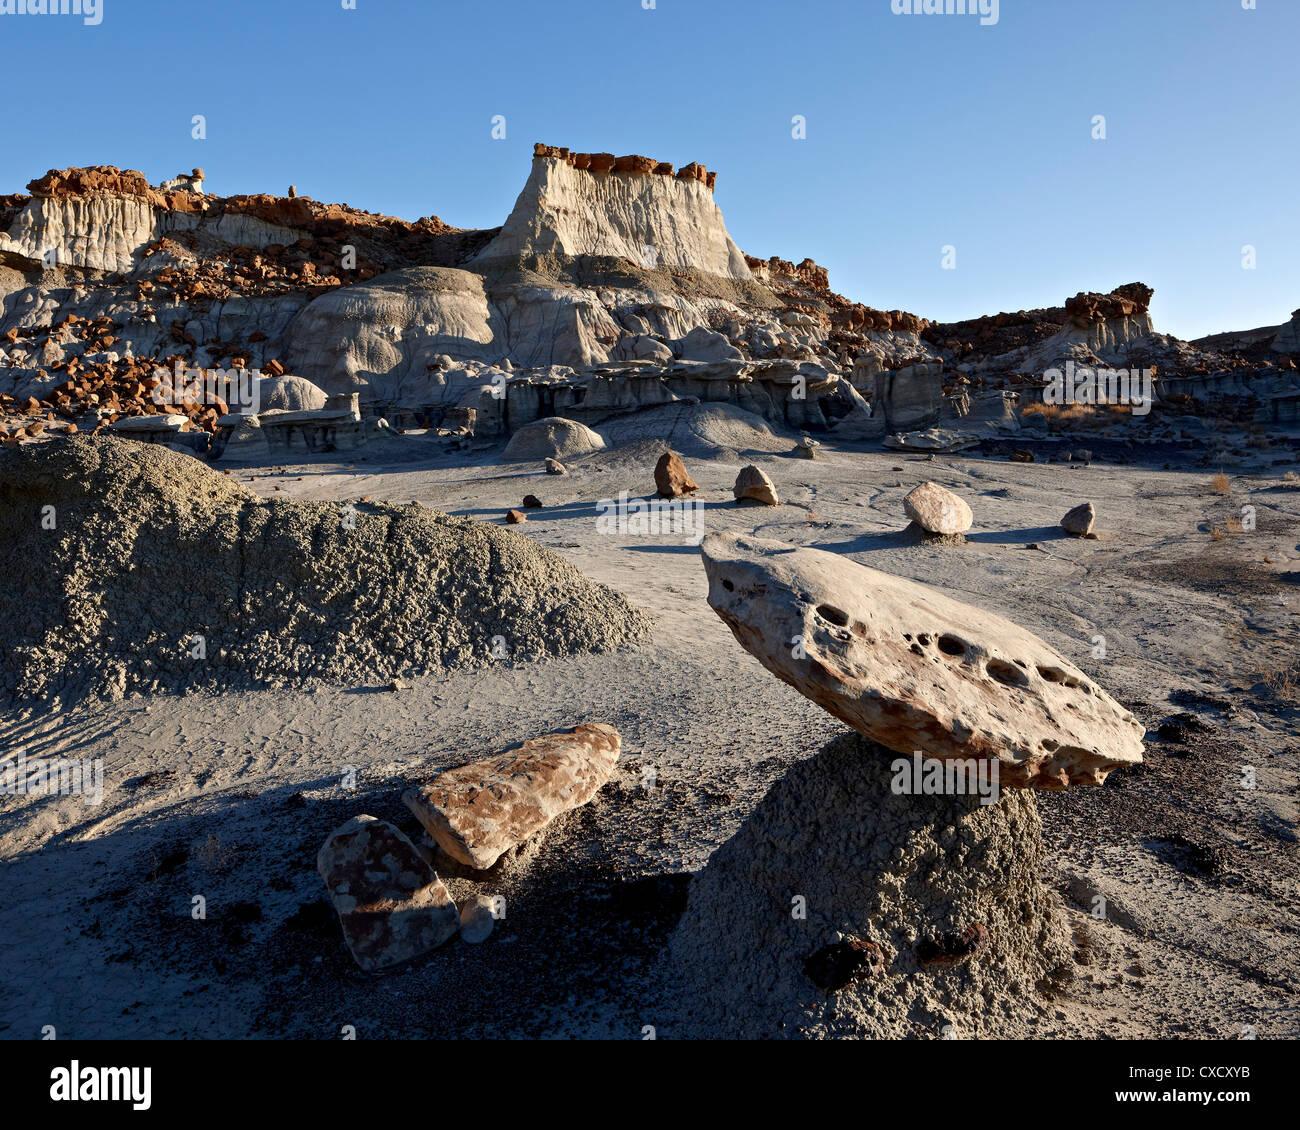 Badlands, Bisti Wilderness, New Mexico, United States of America, North America - Stock Image